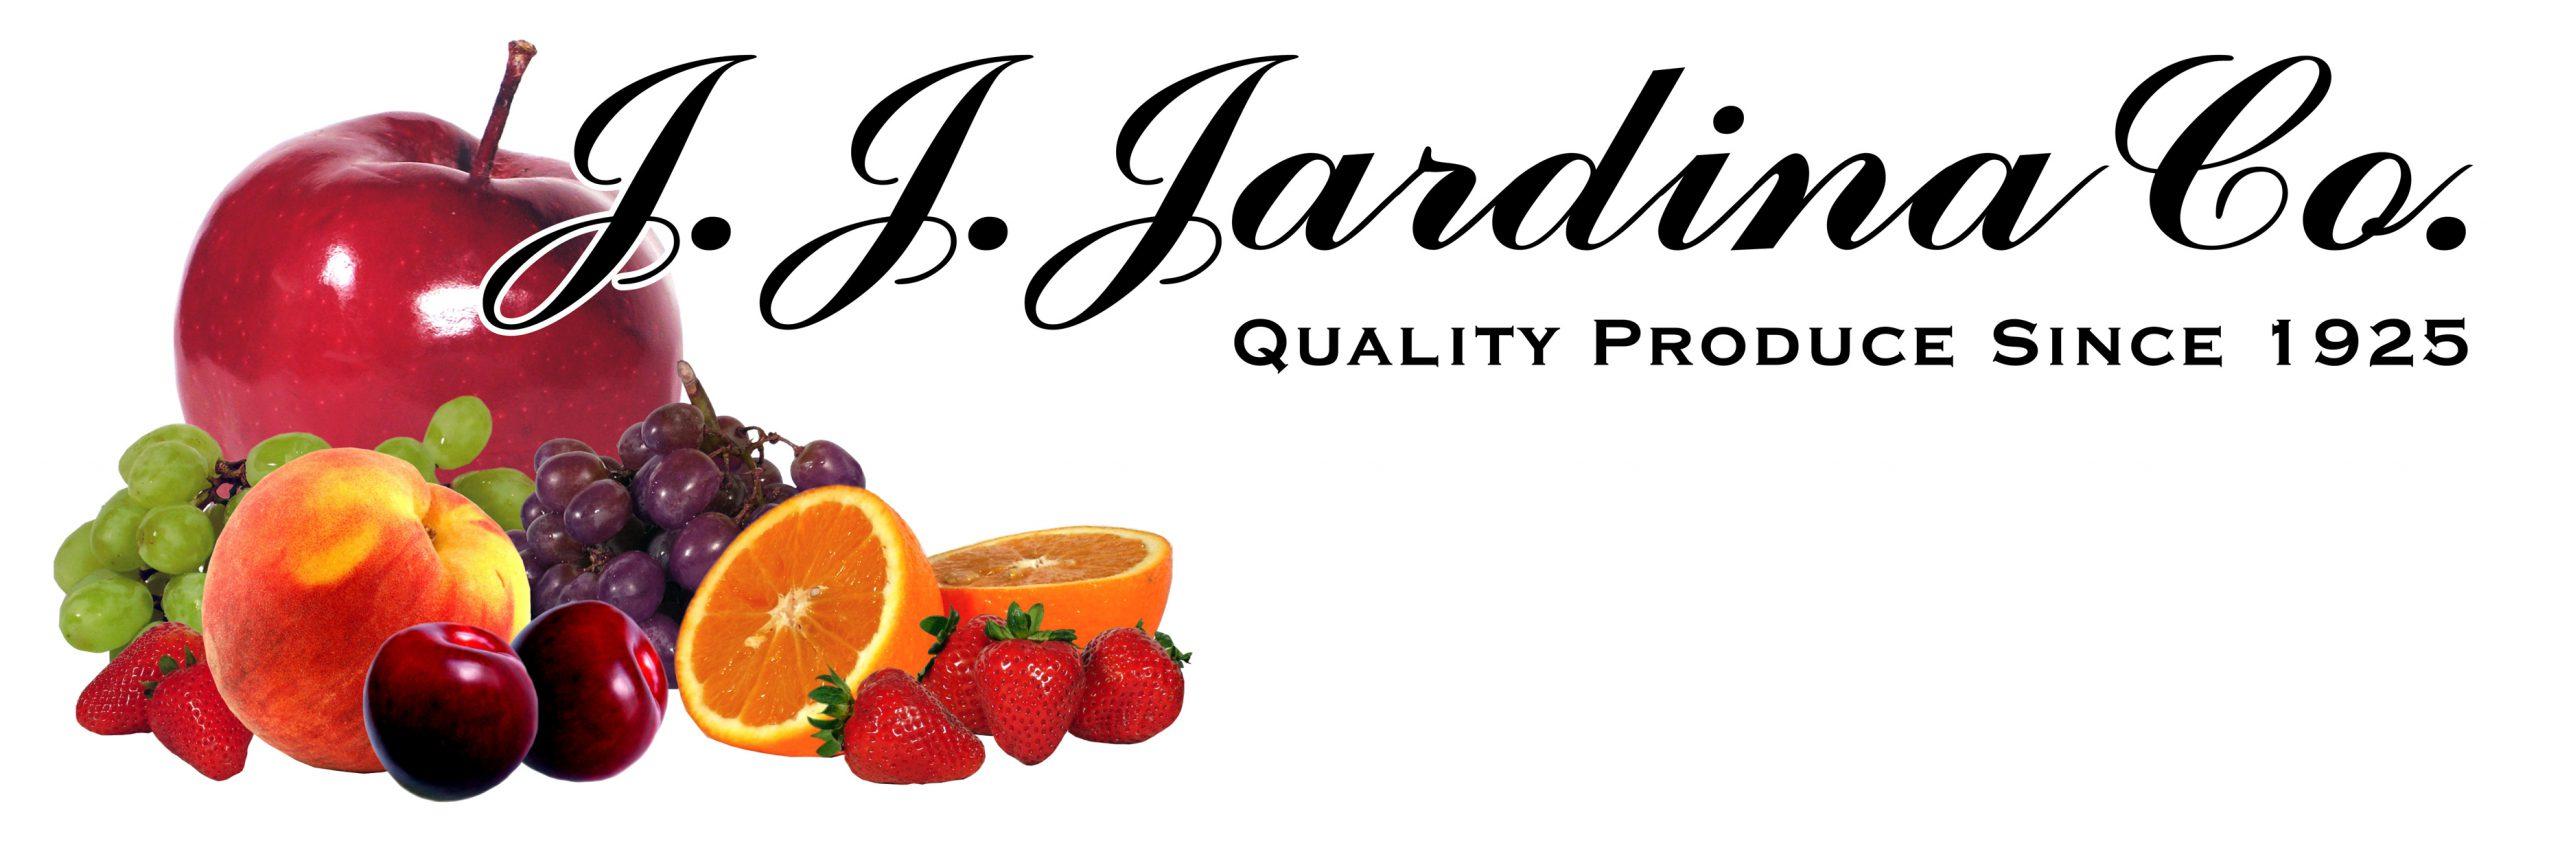 J.J. Jardina